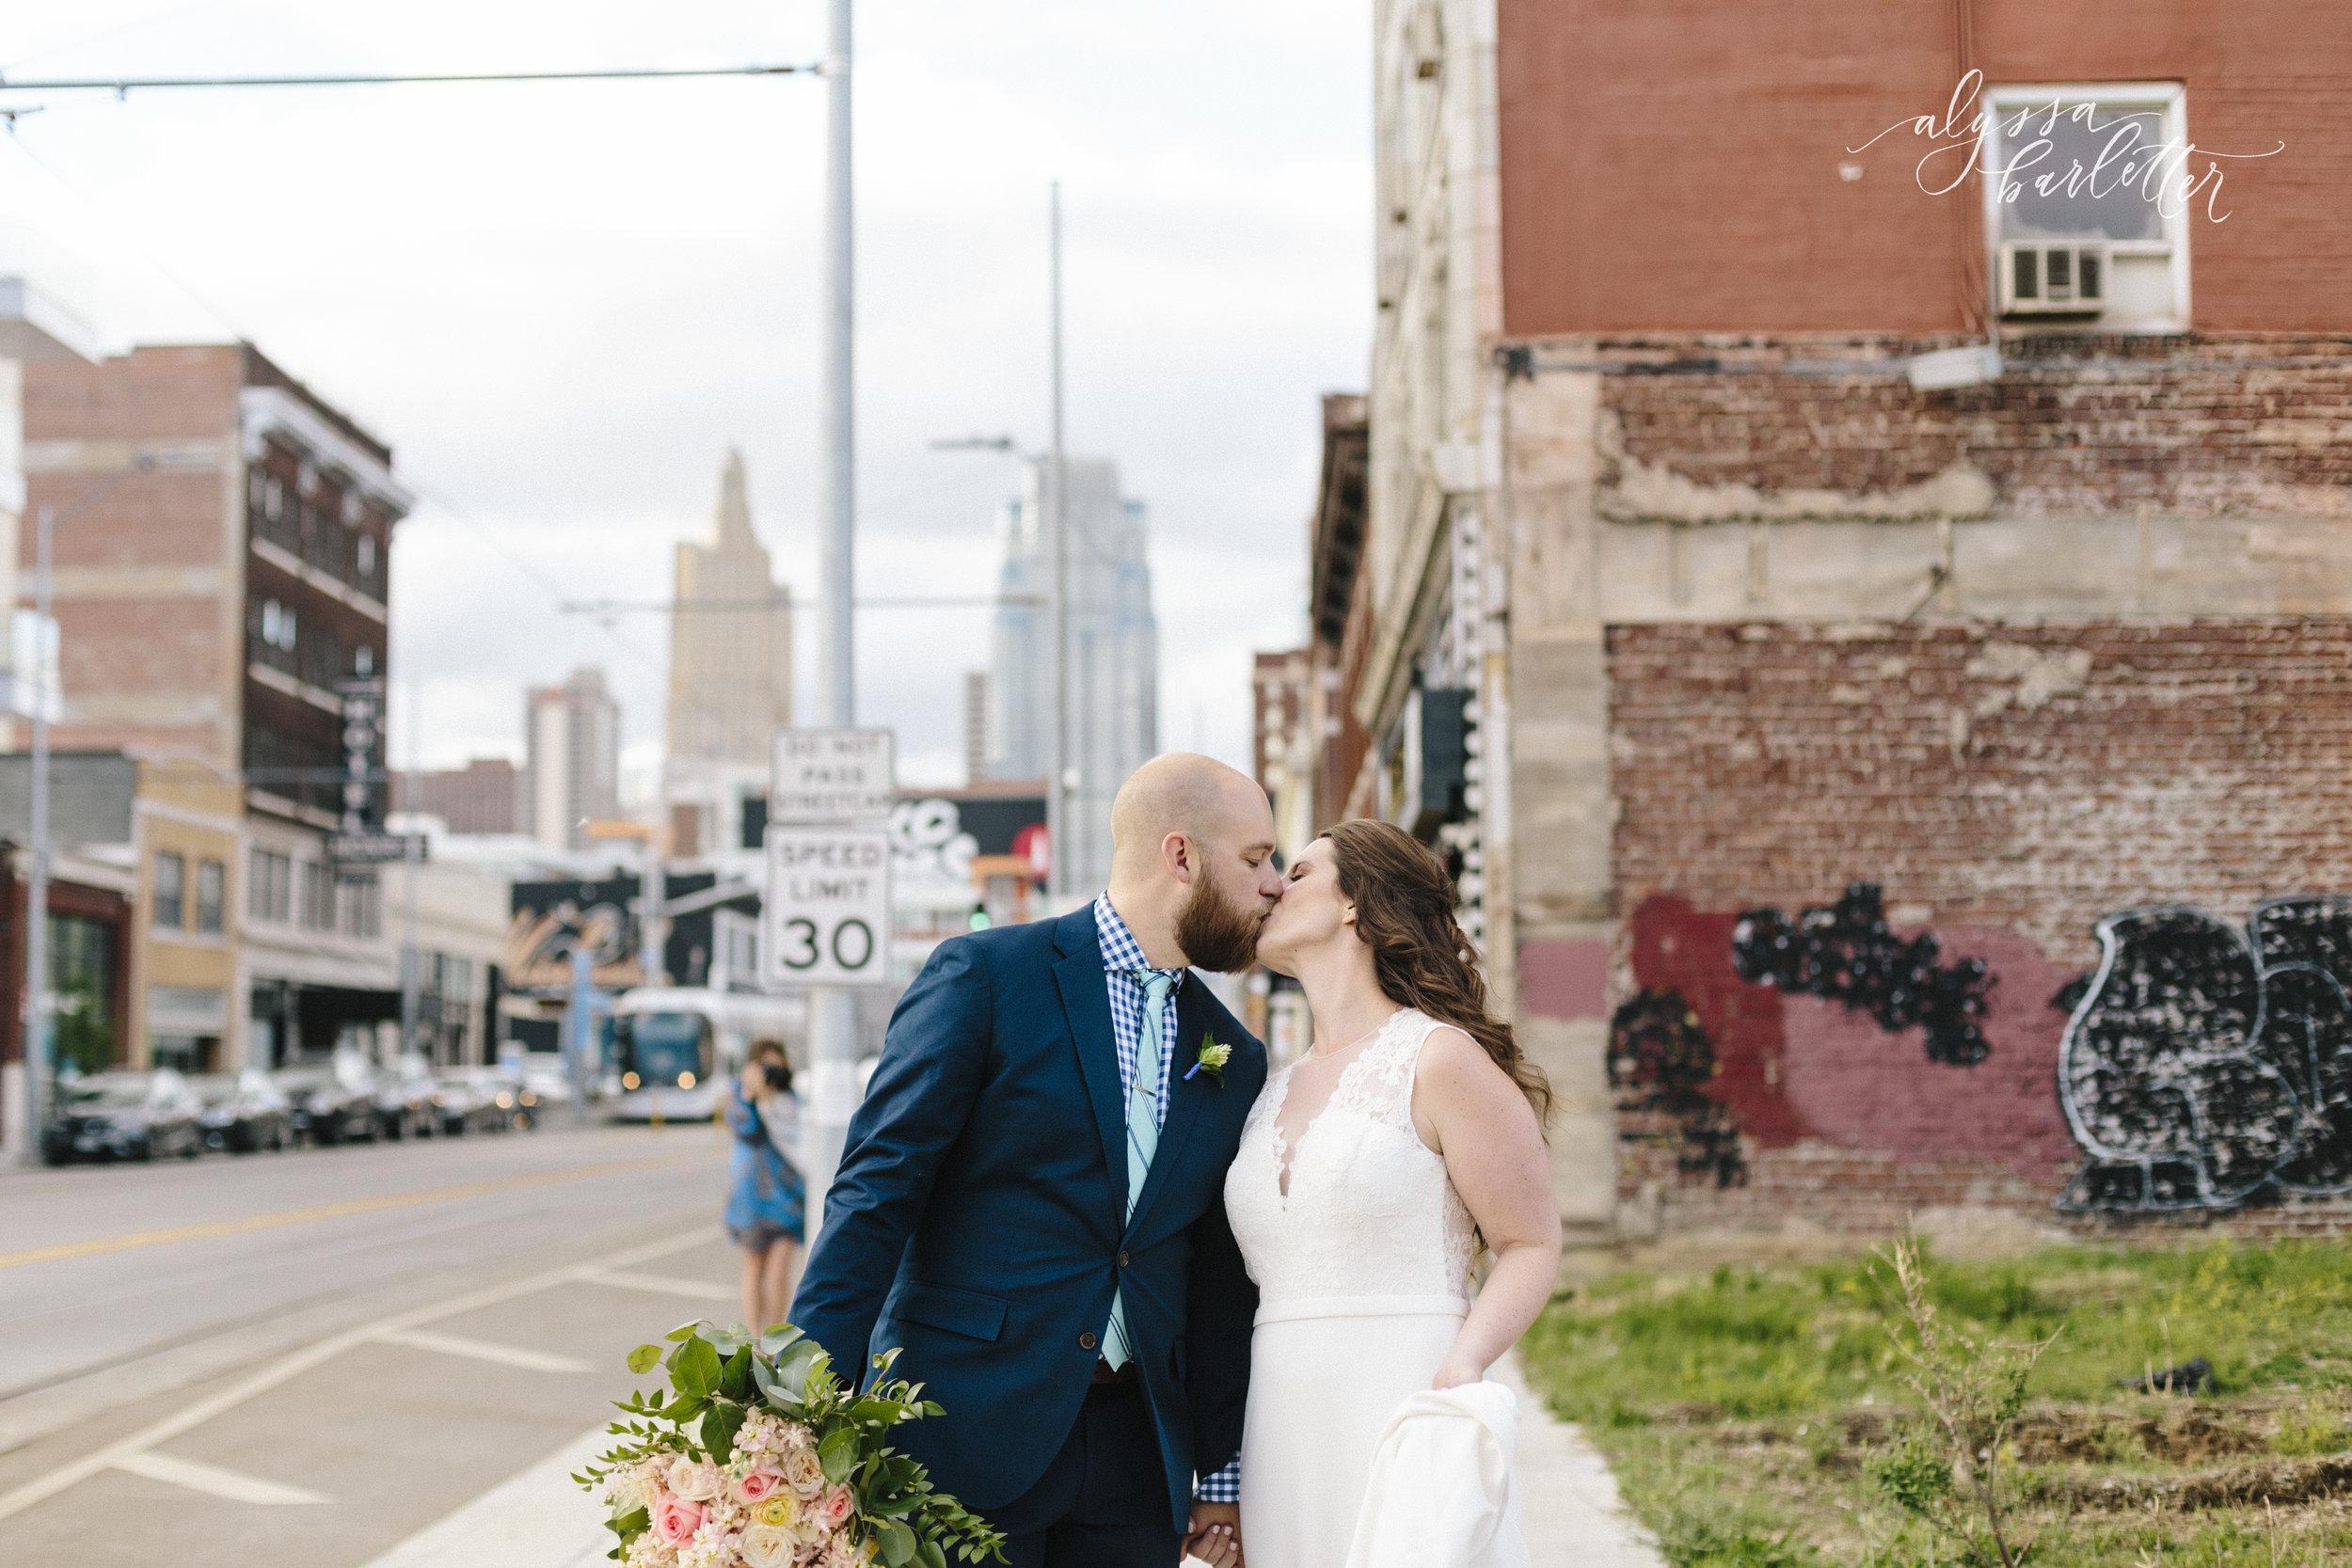 alyssa barletter photography kansas city wedding 2016 main courtney and brian-1-38.jpg